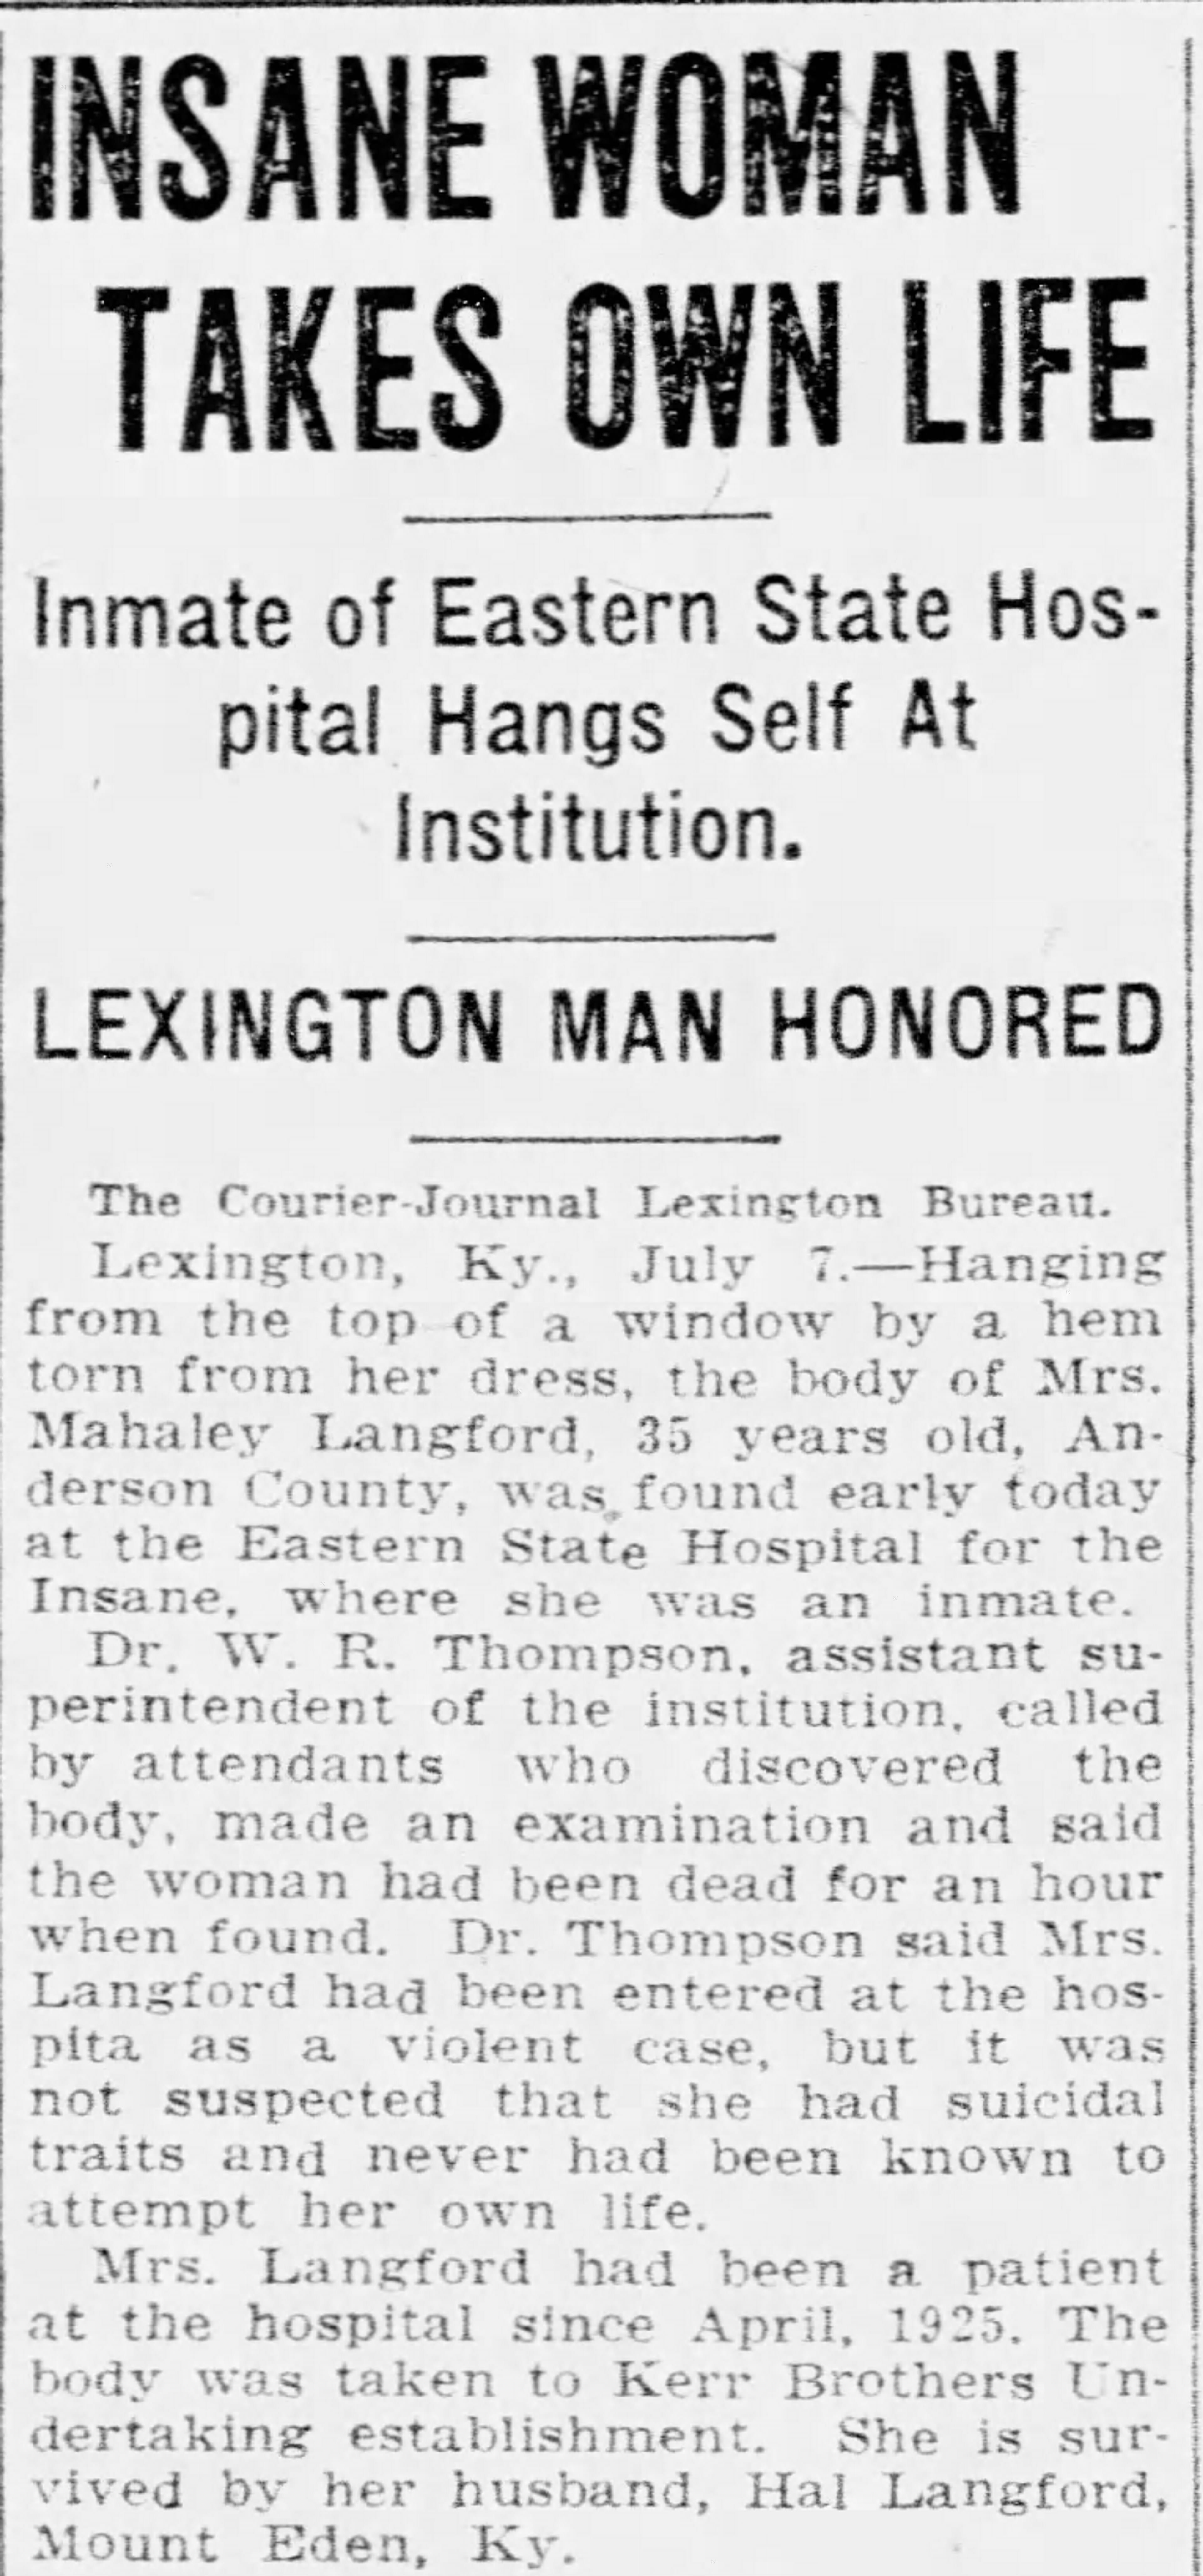 The_Courier_Journal_Thu__Jul_8__1926_